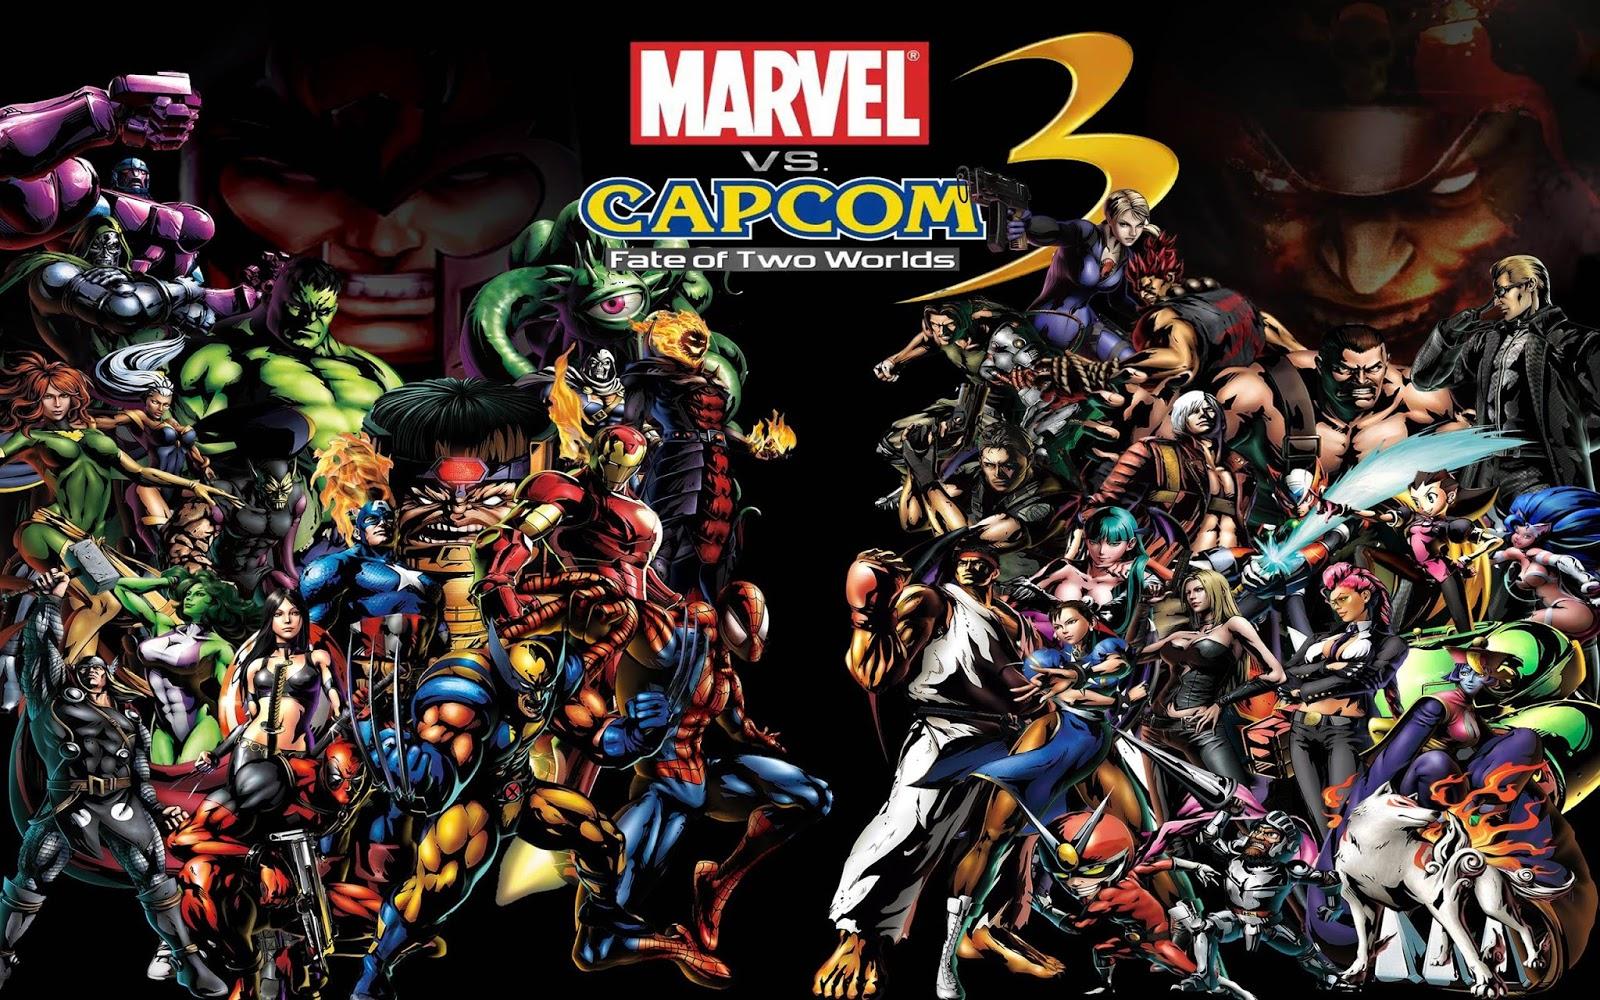 marvel vs capcom free download for windows 7